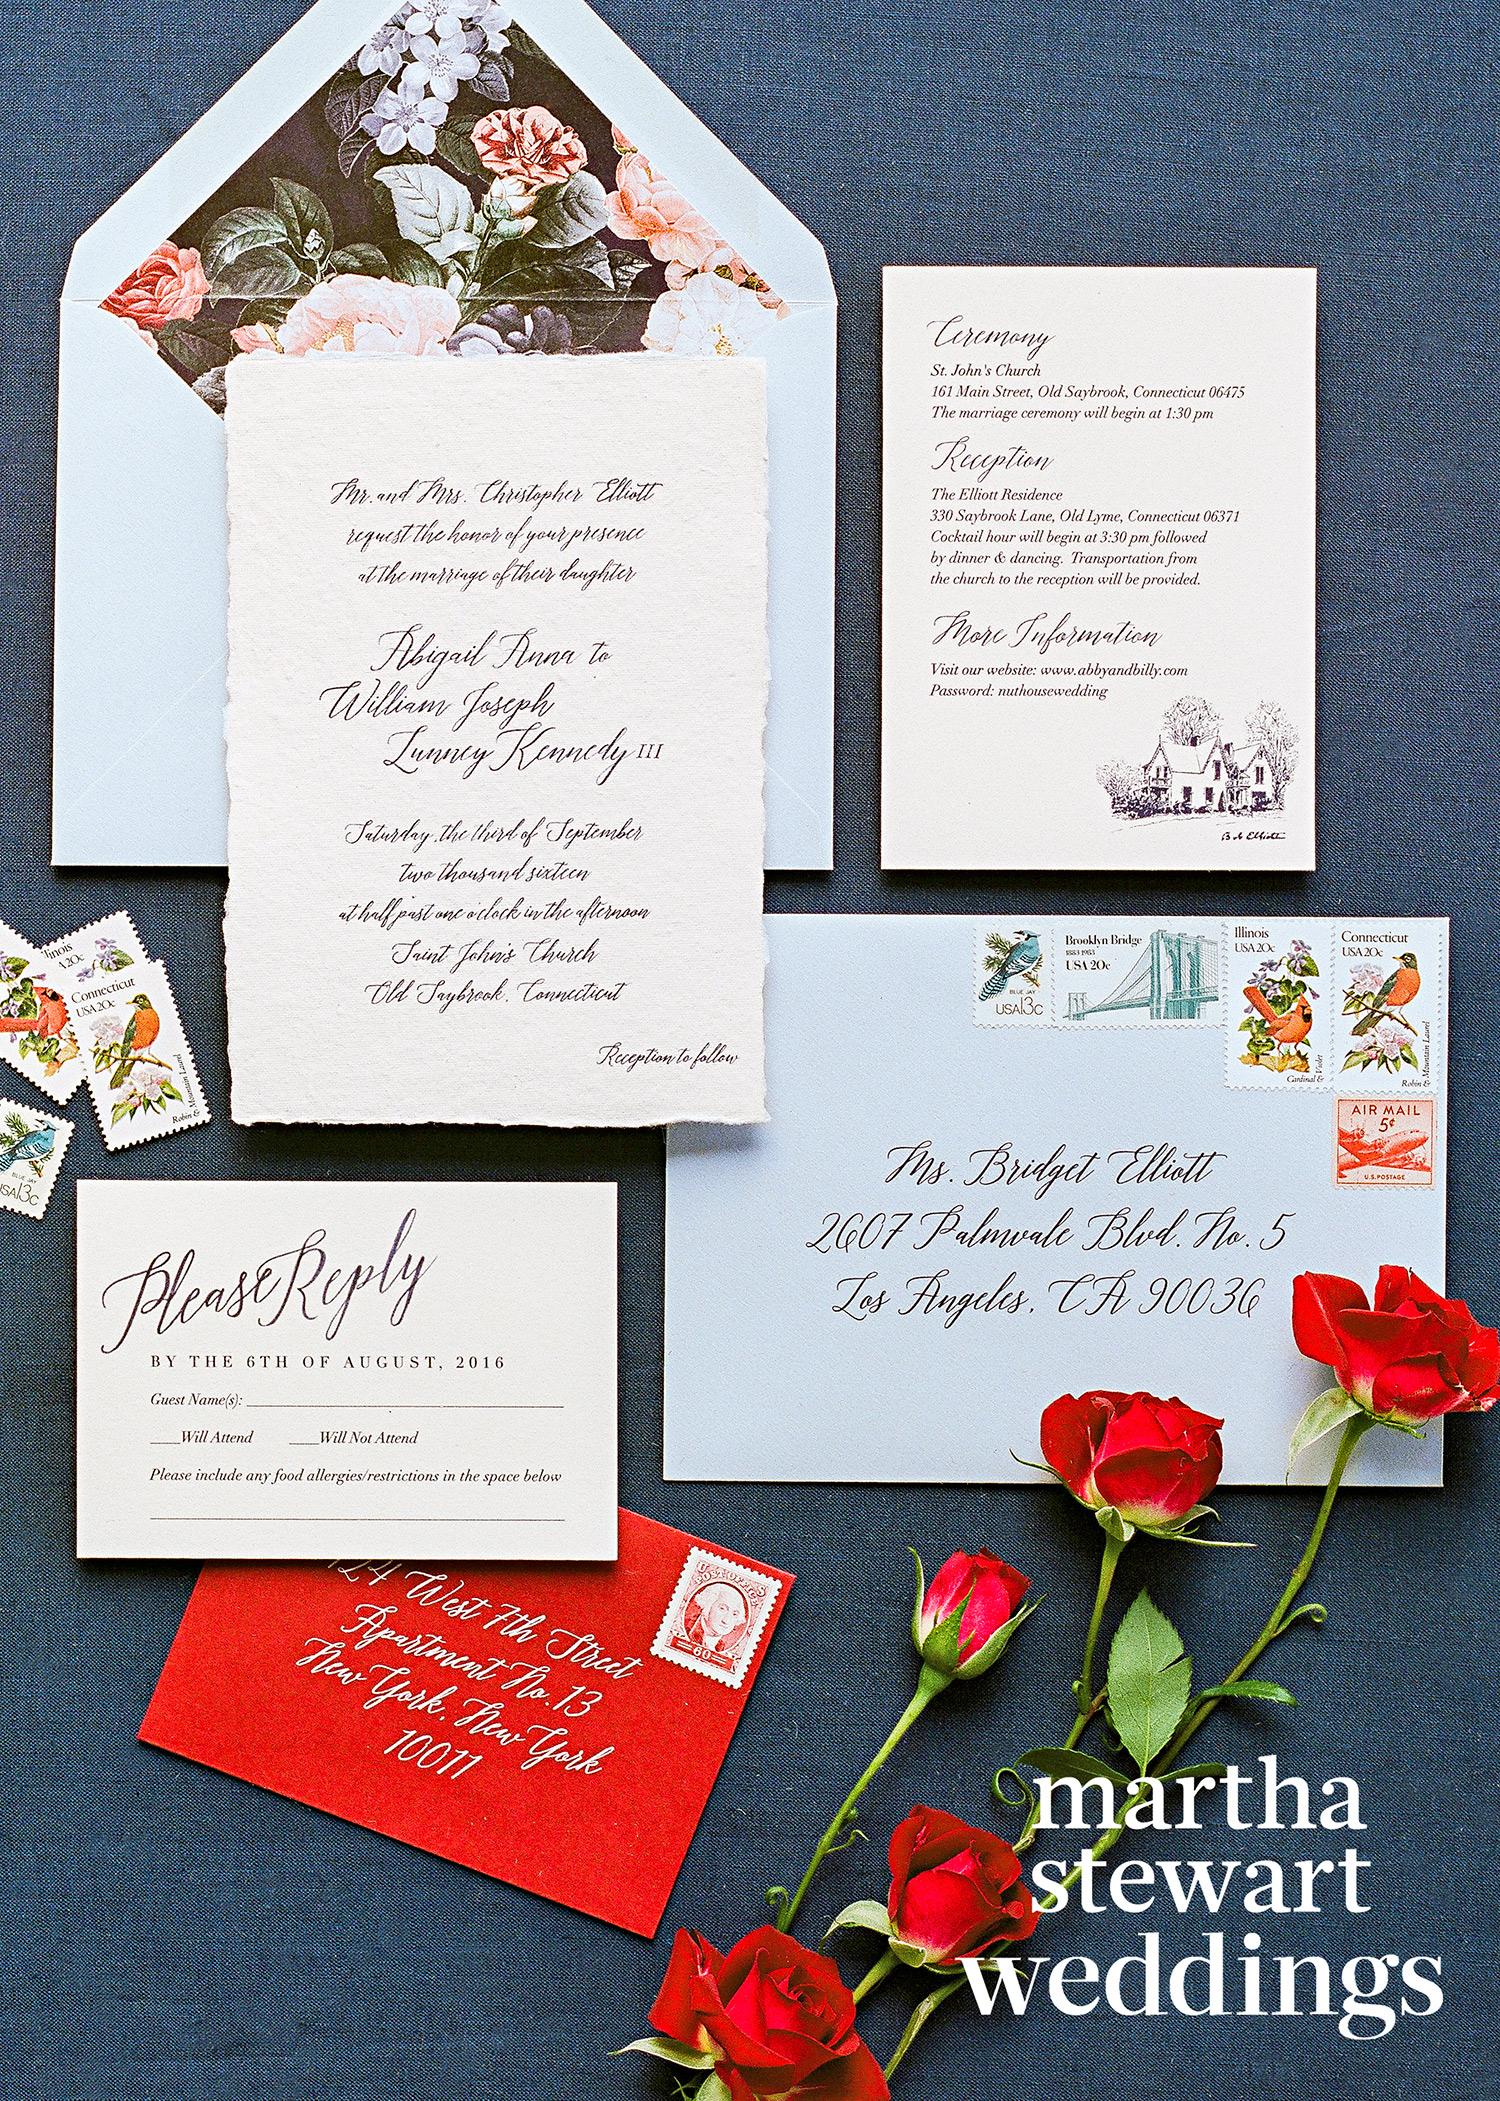 abby elliott bill kennedy wedding stationery